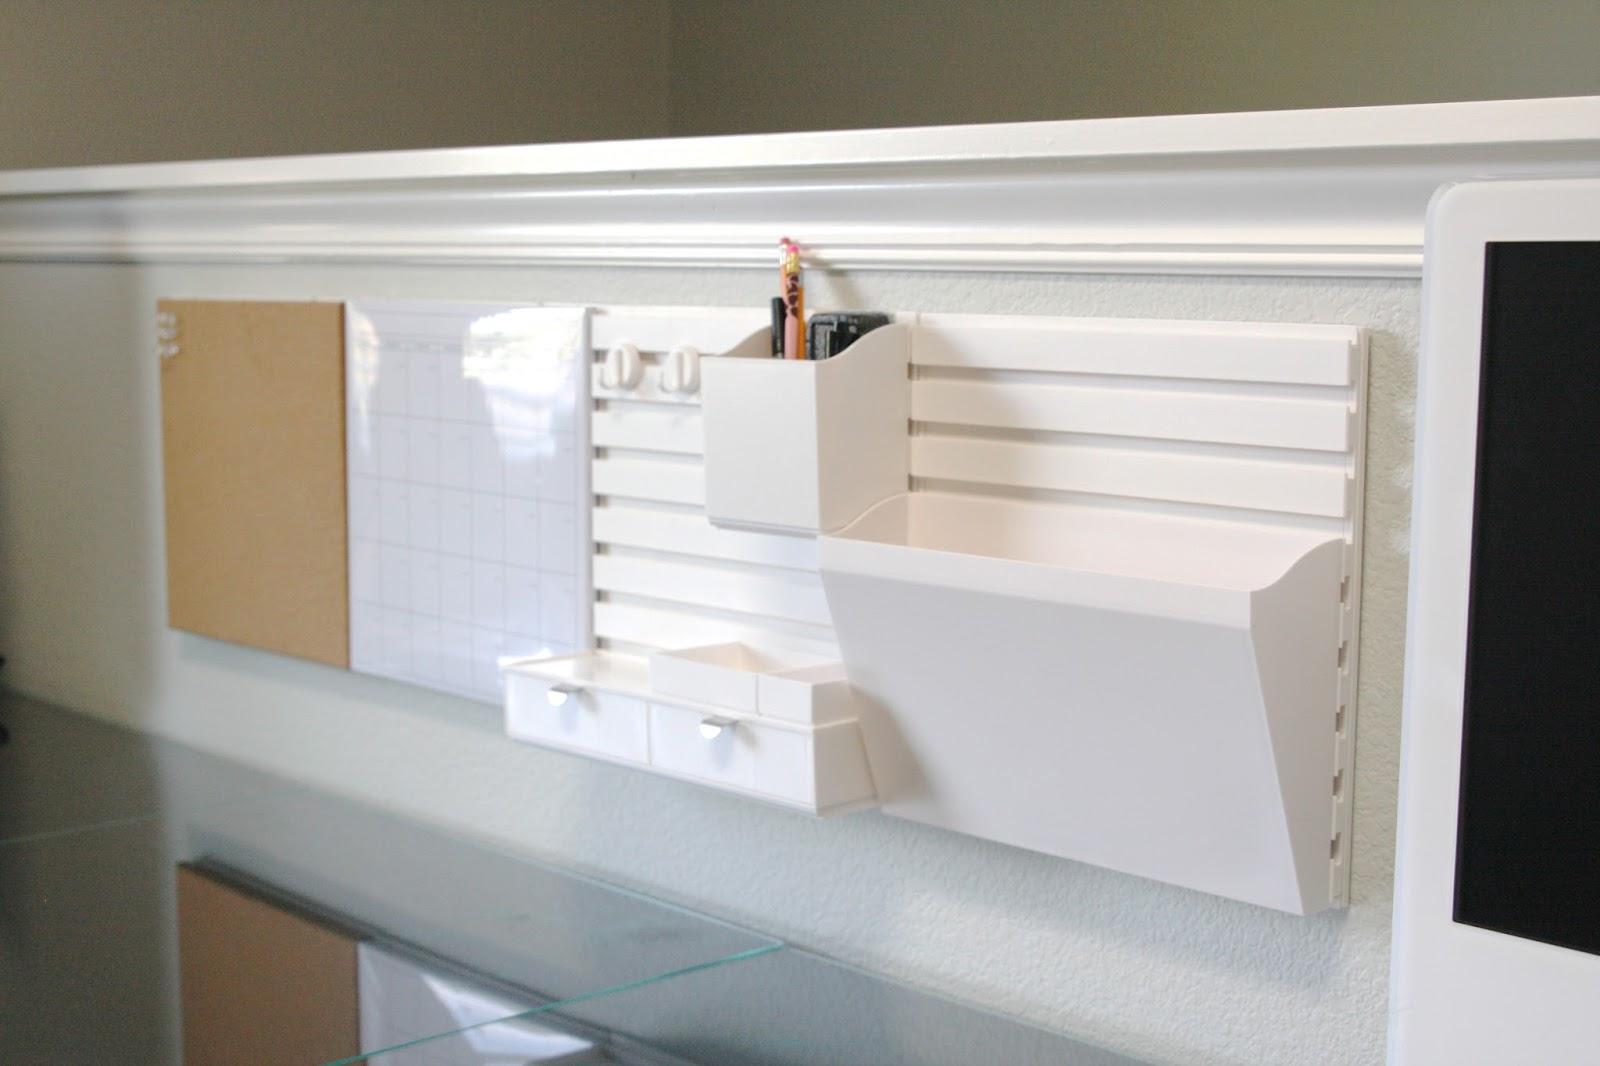 Organized Desktop - with Martha Stewart - simply organized